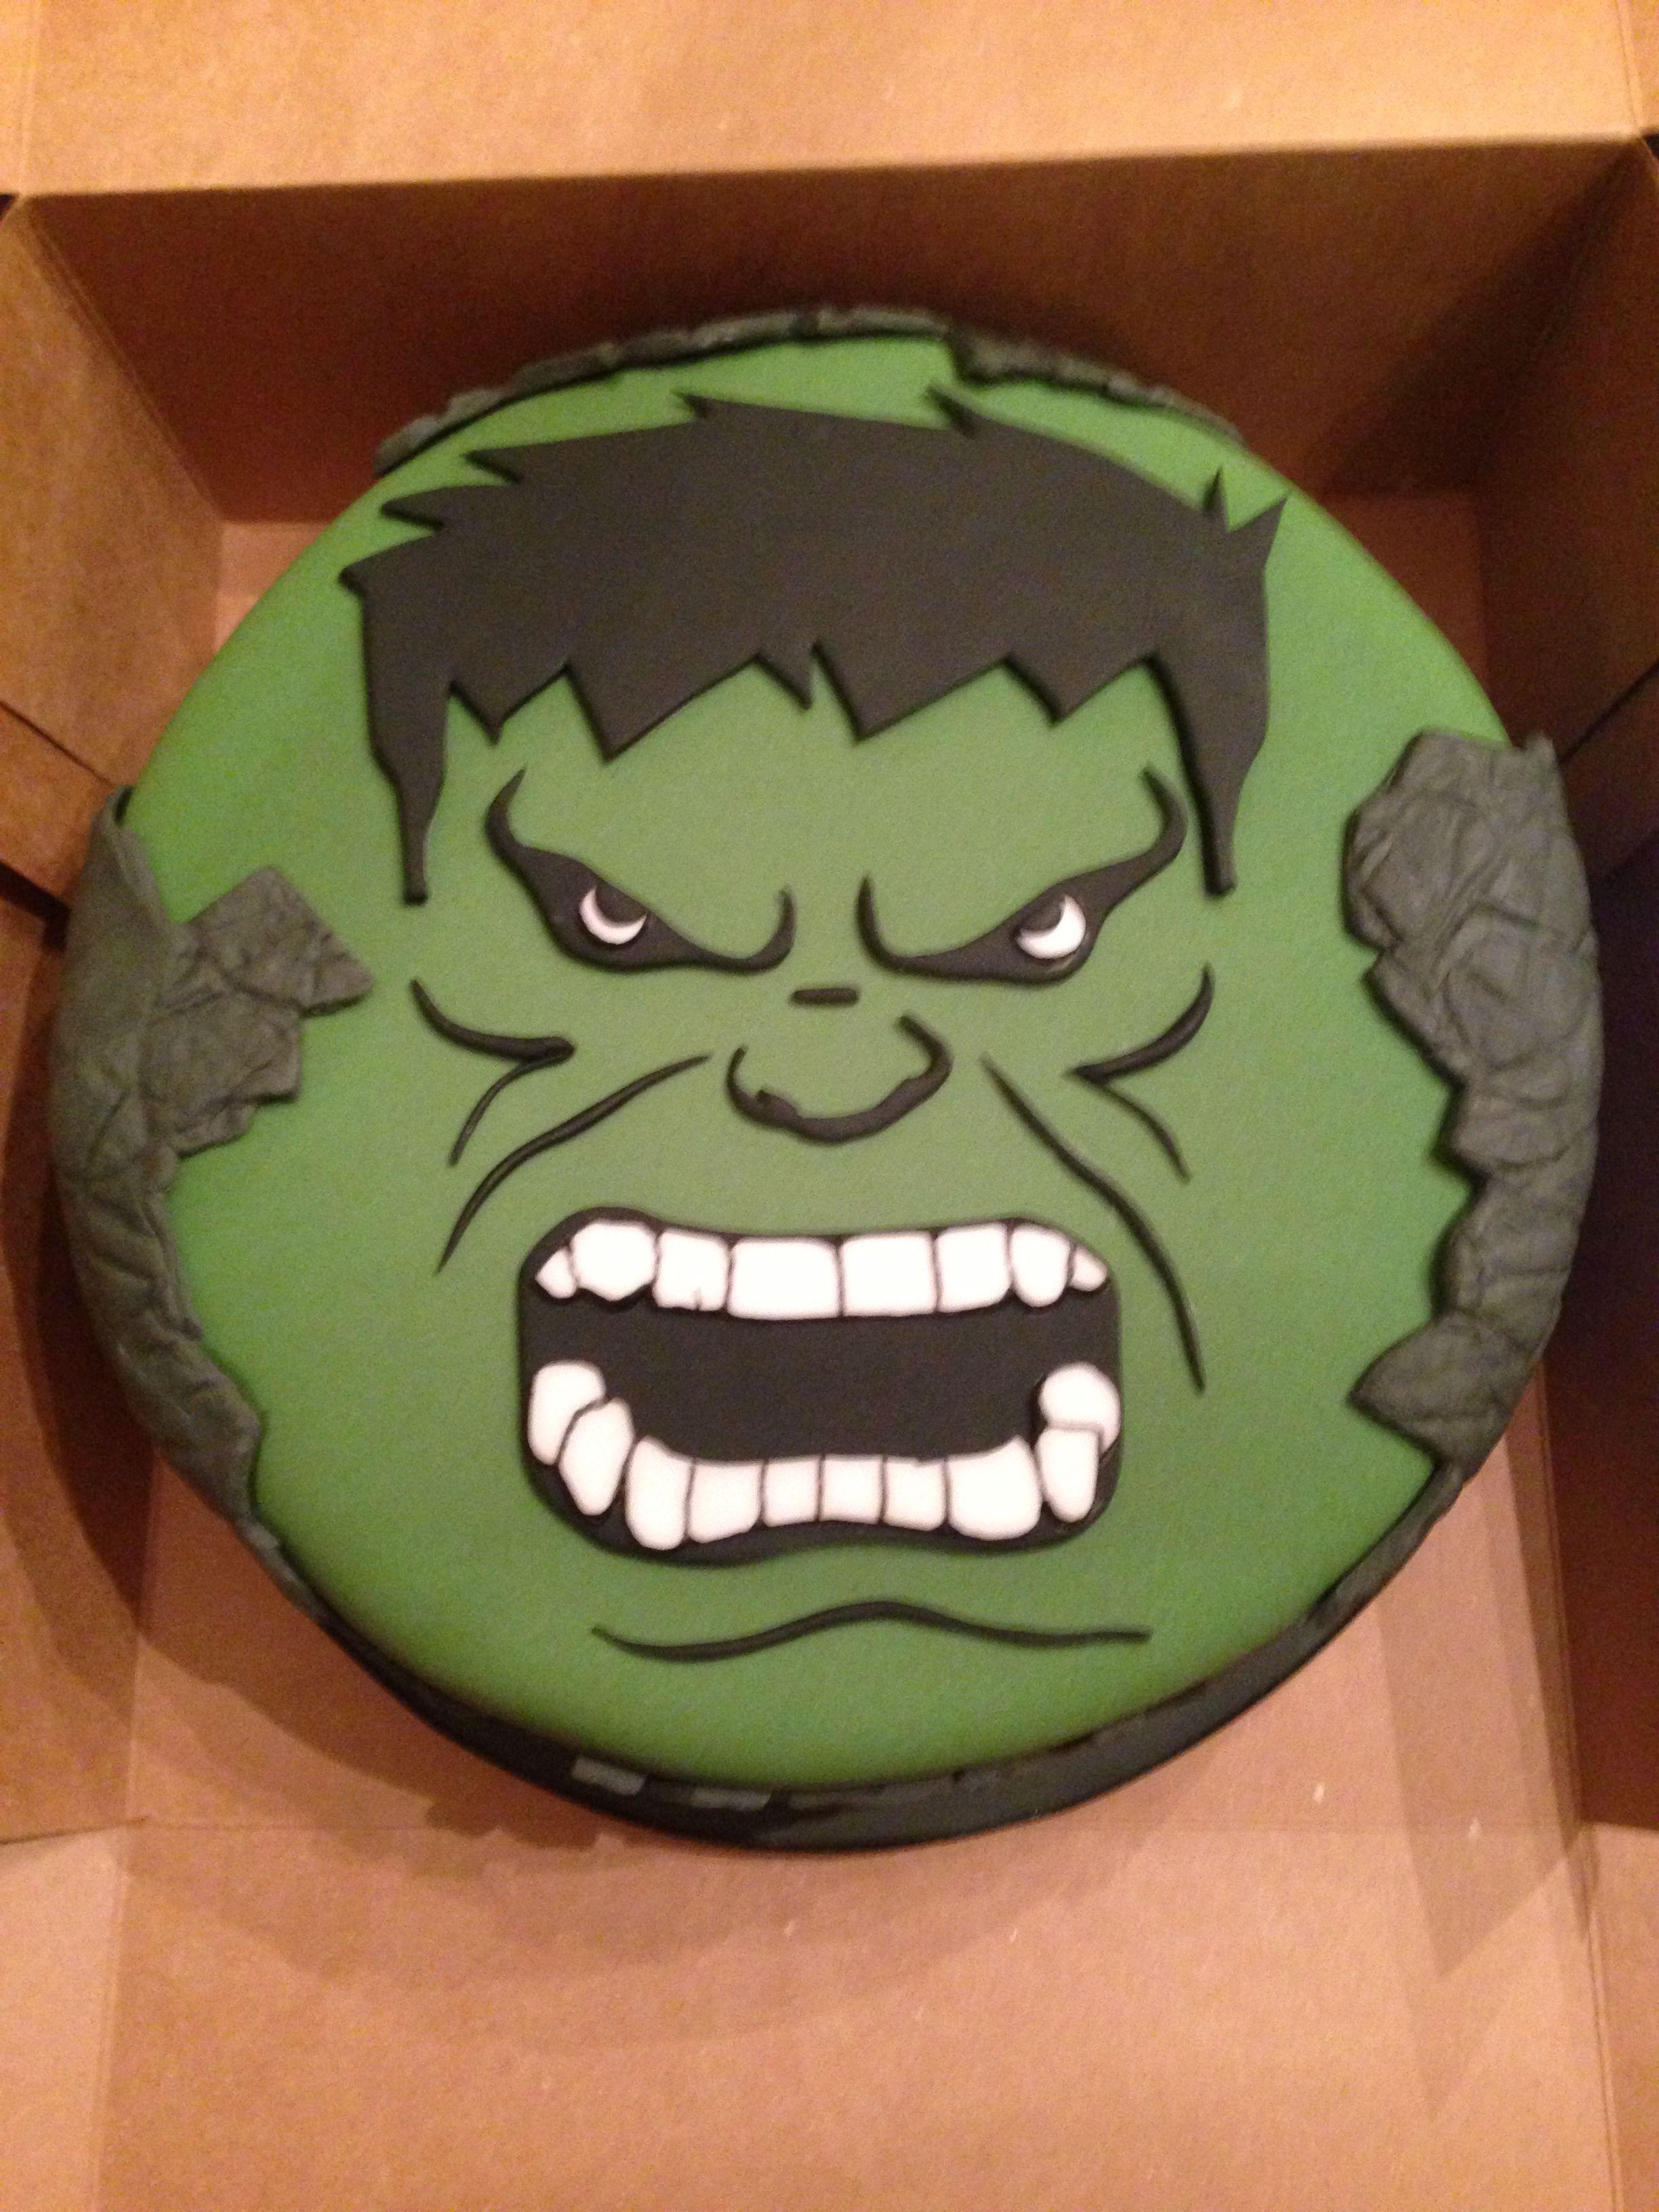 Incredible Hulk Cake I made my cake design Pinterest